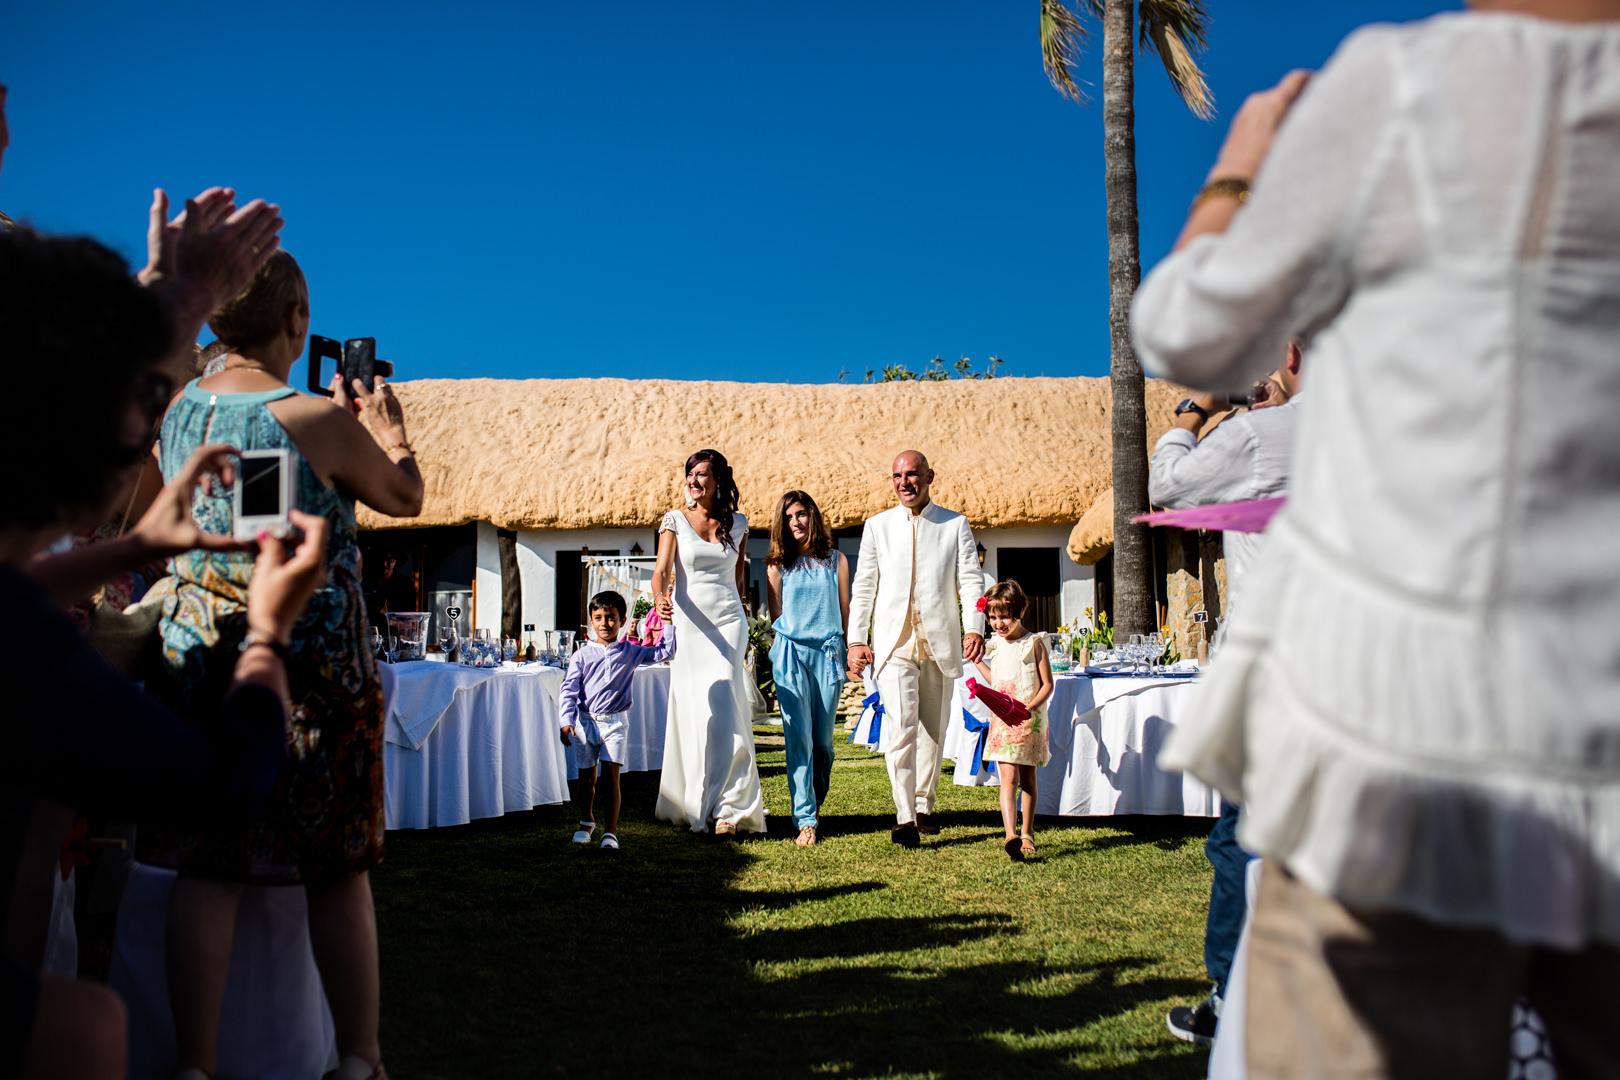 Boda-Sajorami-Beach-Cadiz-Zahora-Pedro-Gema-engagement-Rafael-Torres-fotografo-bodas-sevilla-madrid-barcelona-wedding-photographer--26.jpg